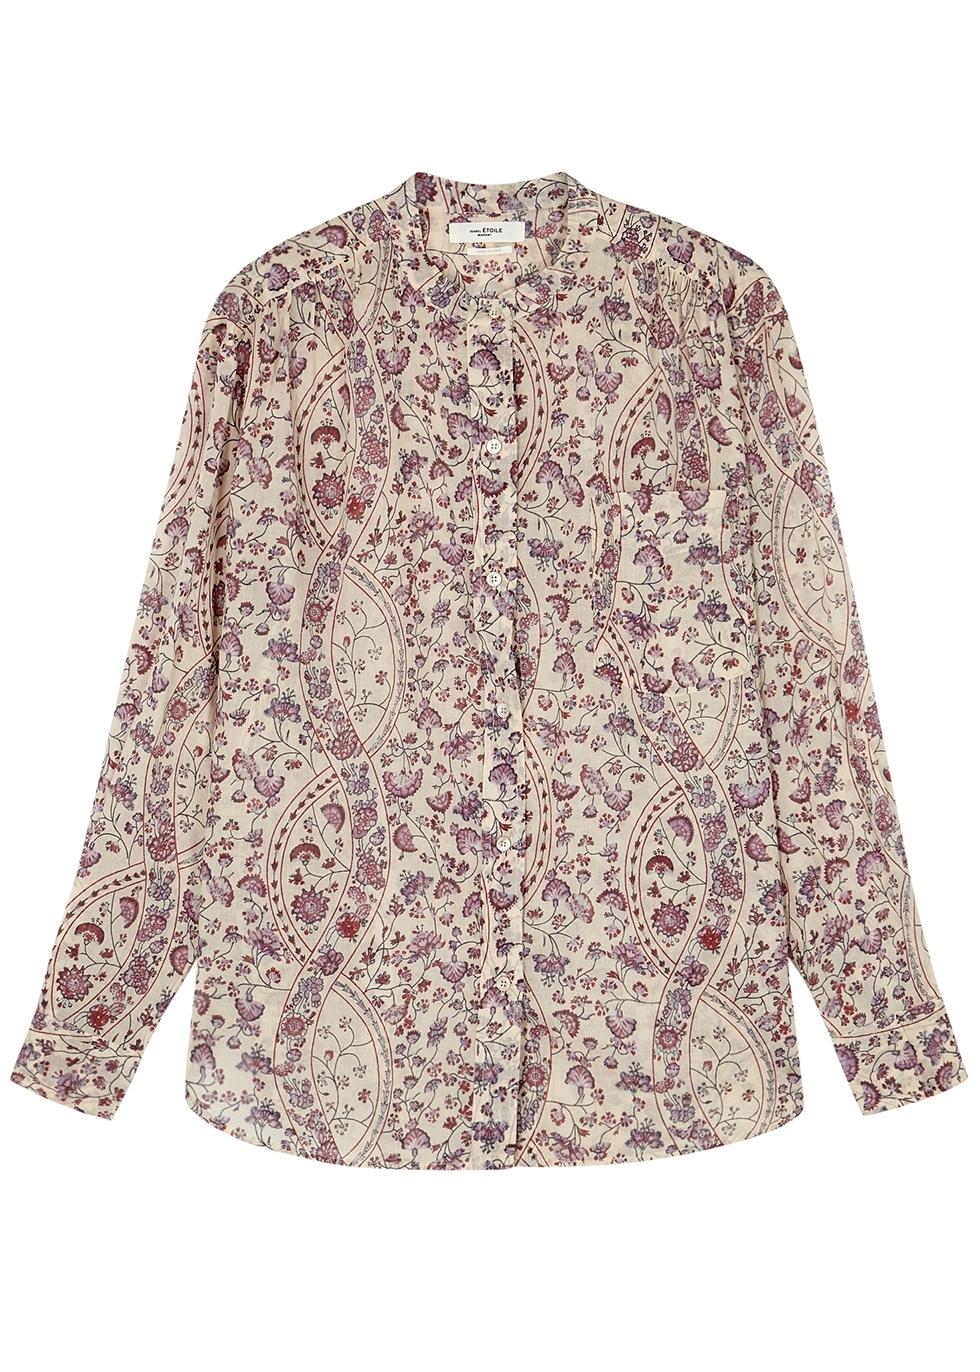 effec56963b253 Women's Designer Tops - Lace & Silk - Harvey Nichols